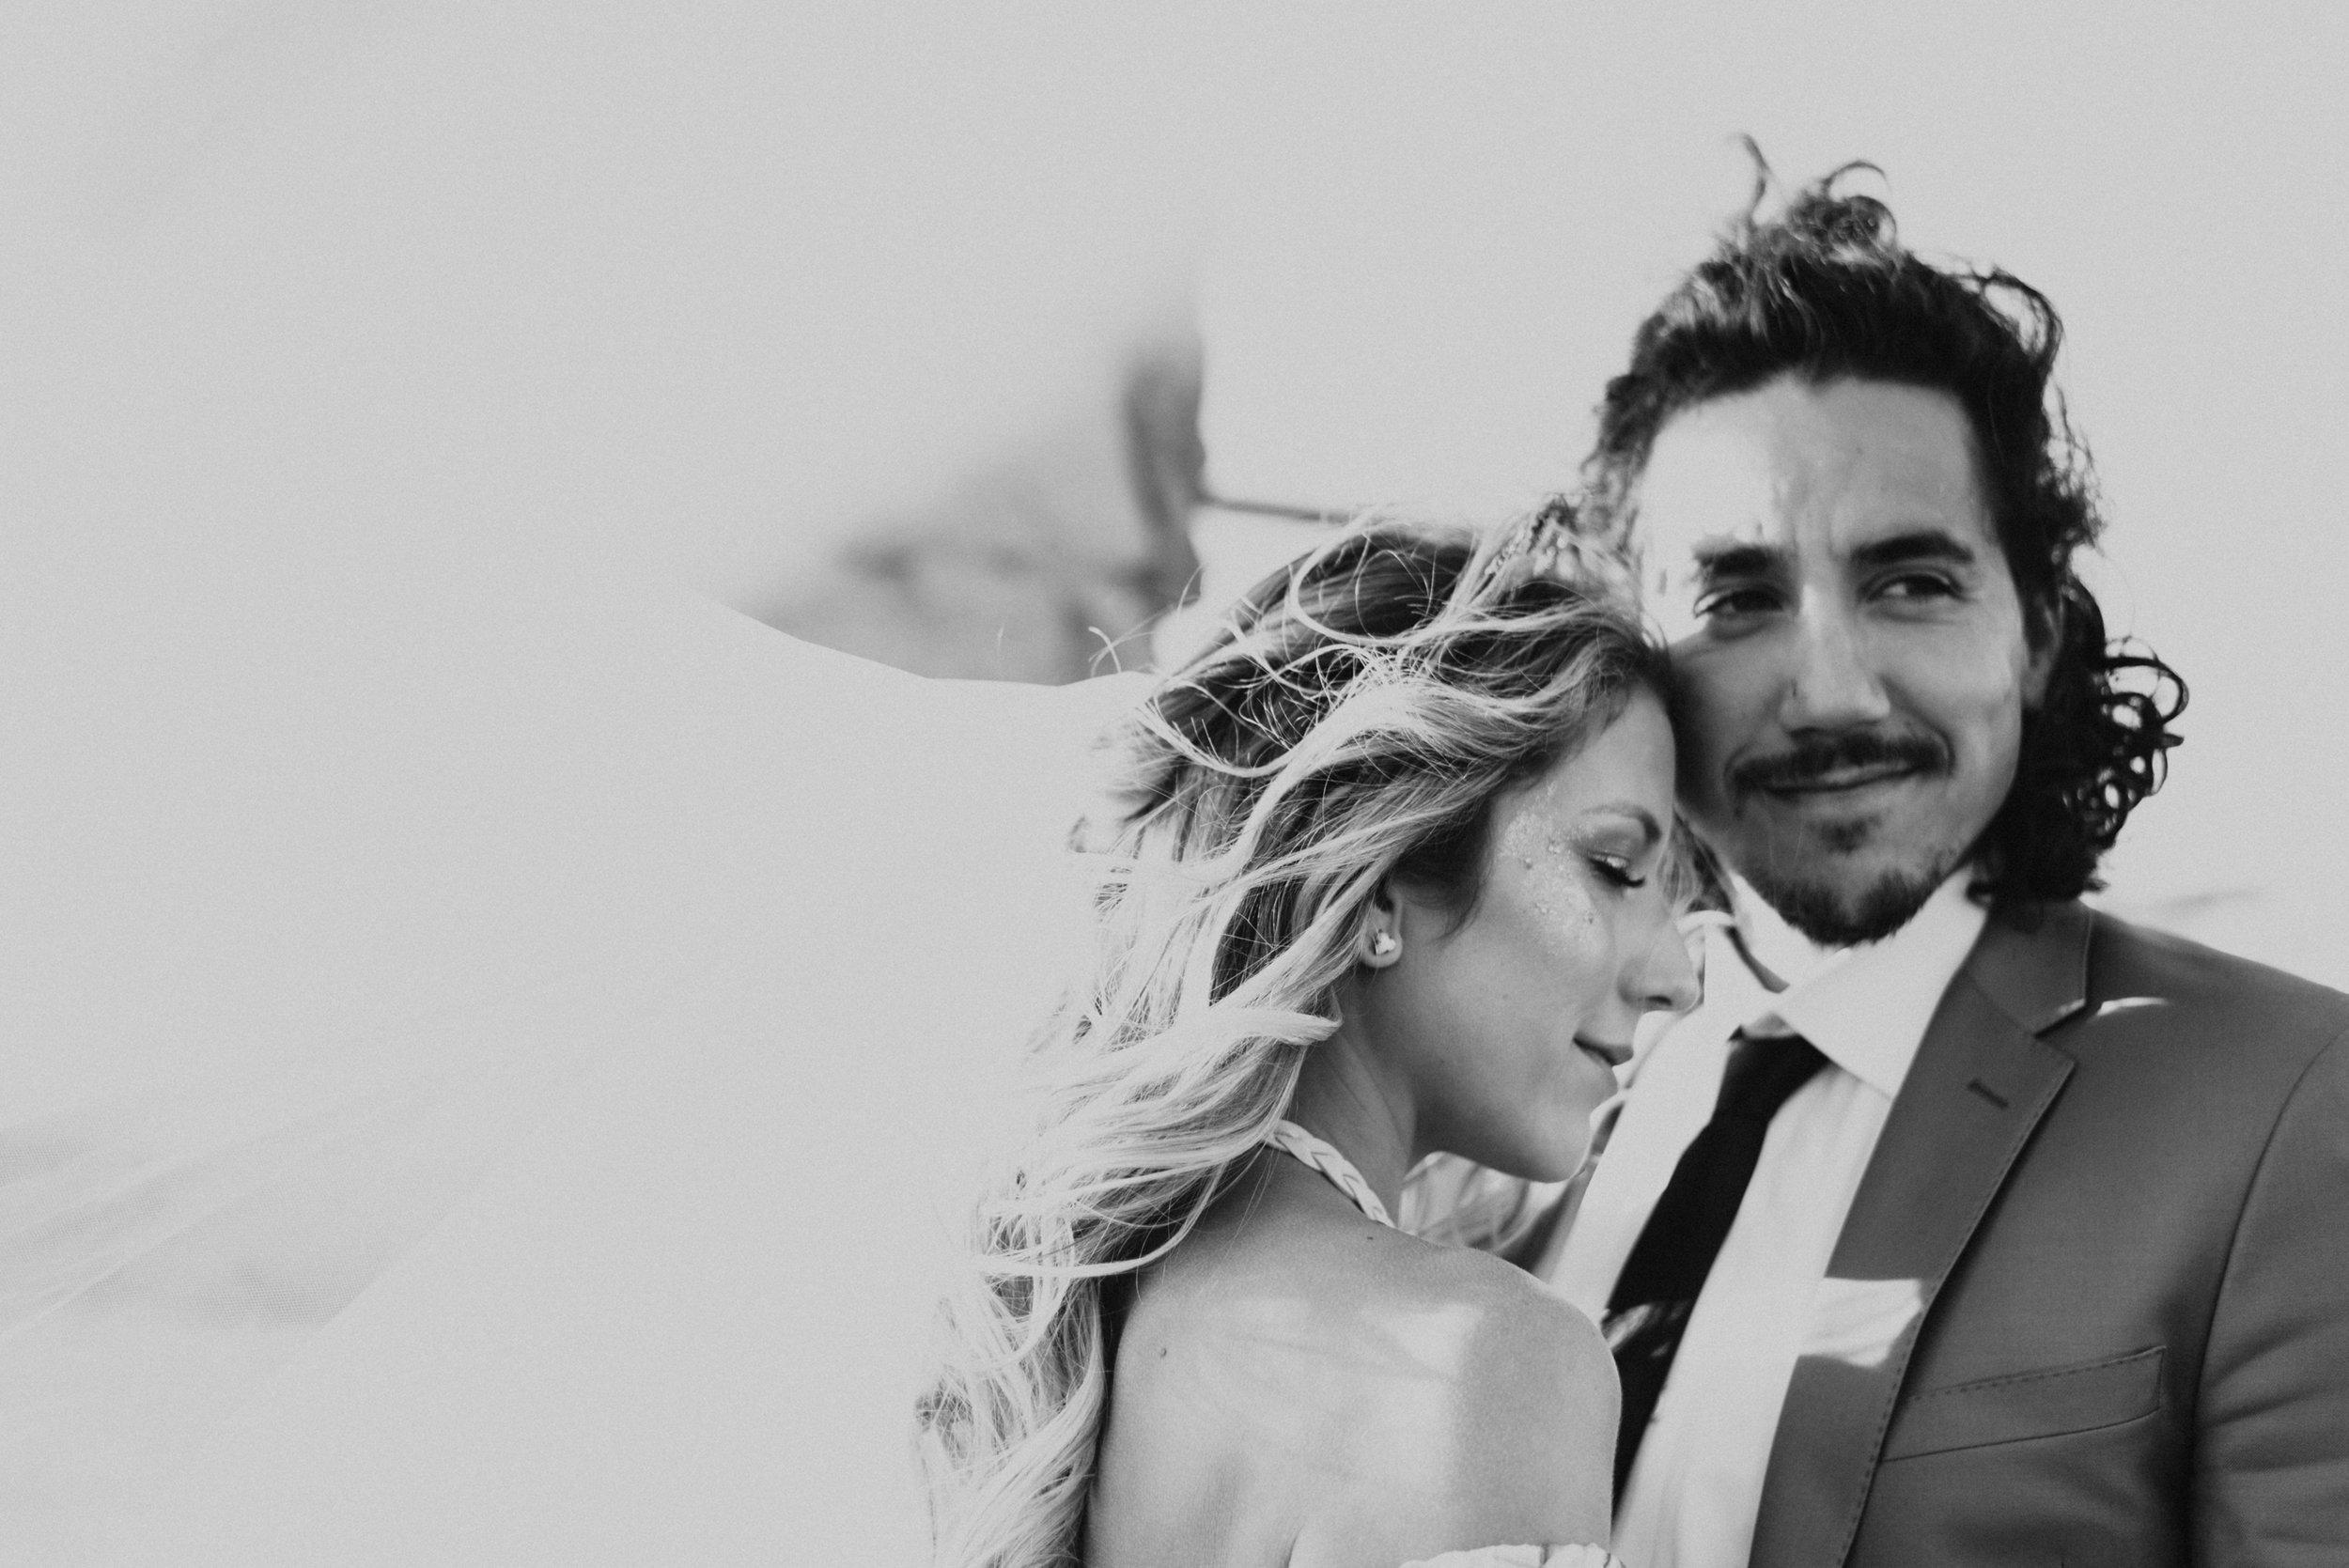 FortSt.John_photographer_TyraEPhotography_Wedding_Couple_Family_Photograhy_DawsonCreek_Elopement_Bride_Boduoir_Portraits-7883.jpg